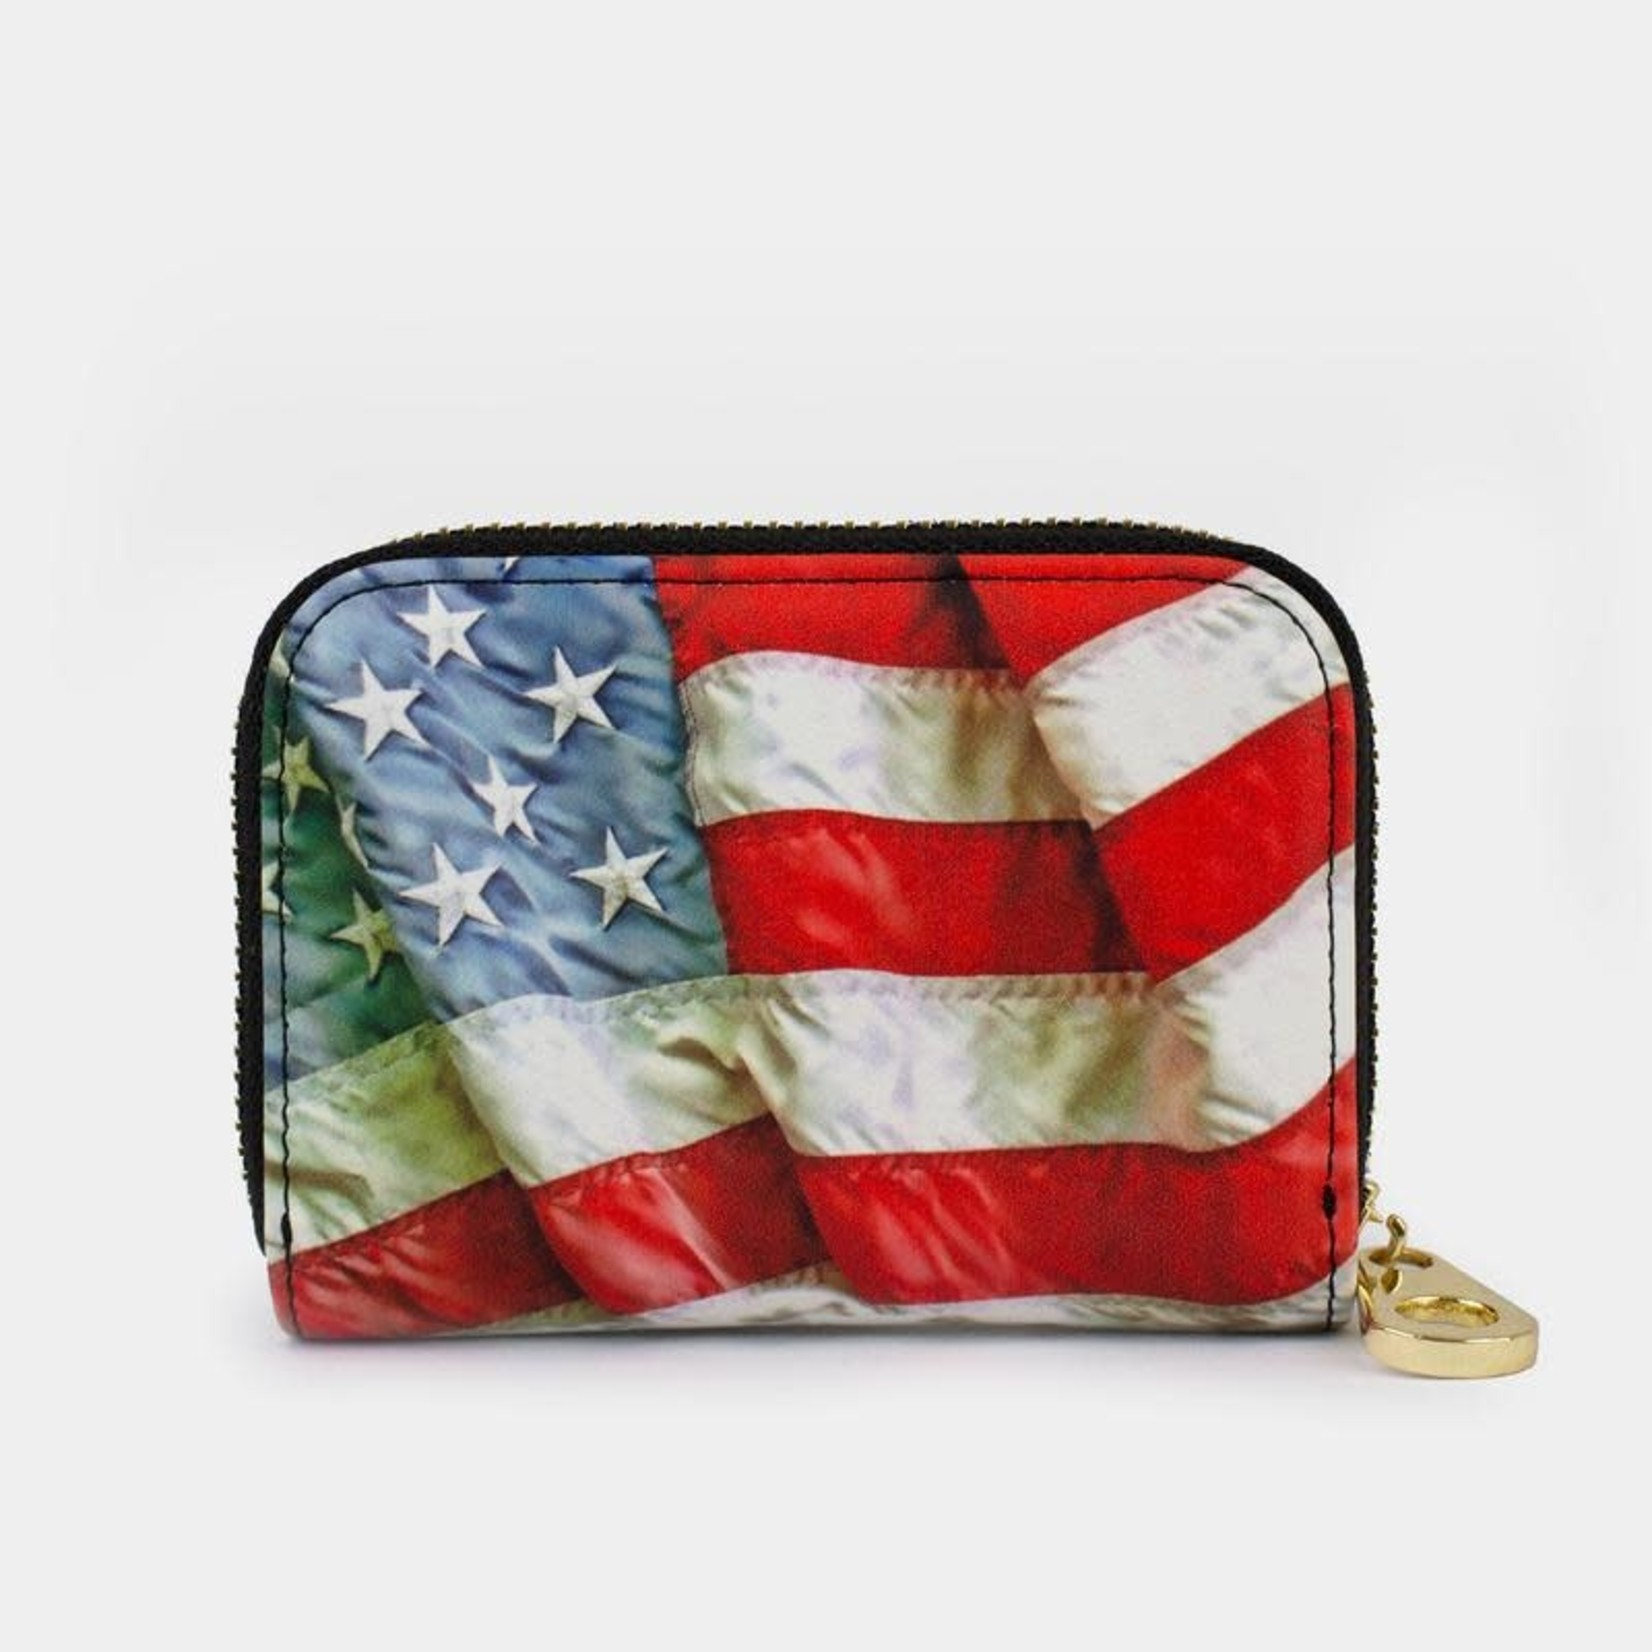 Monarque Zippered Wallet - American Flag